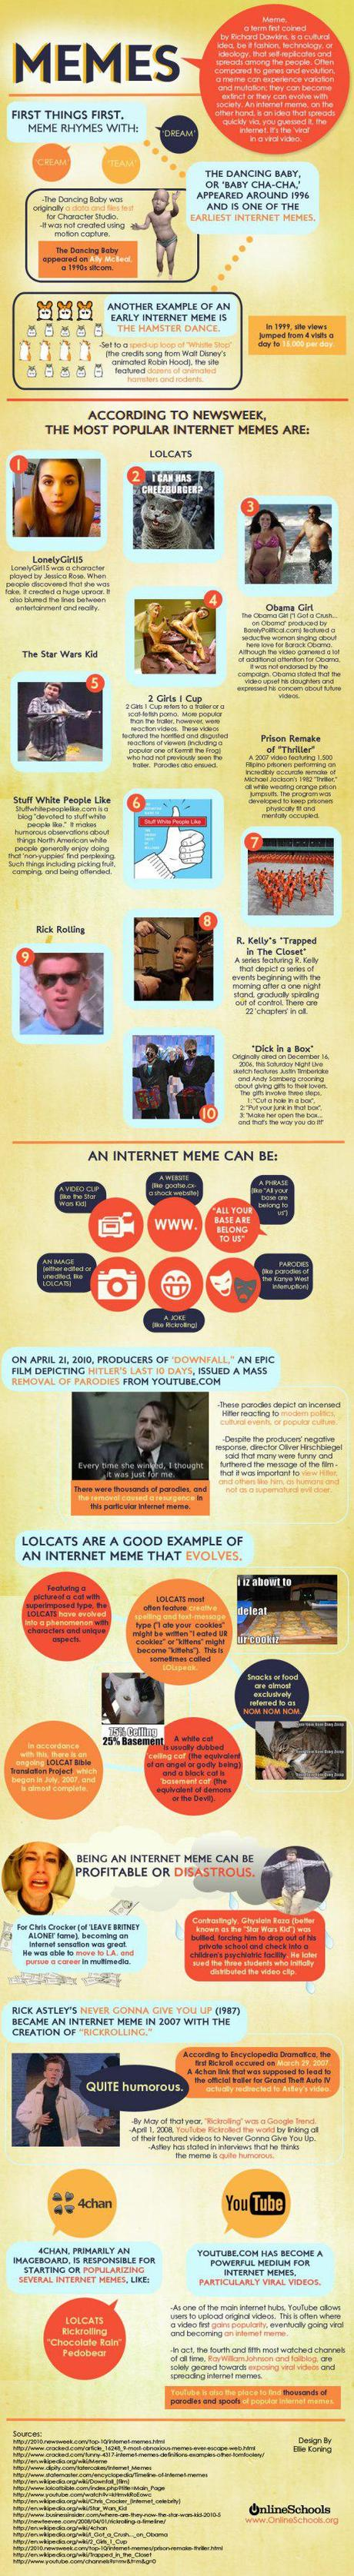 Complete set of Internet most famous memes